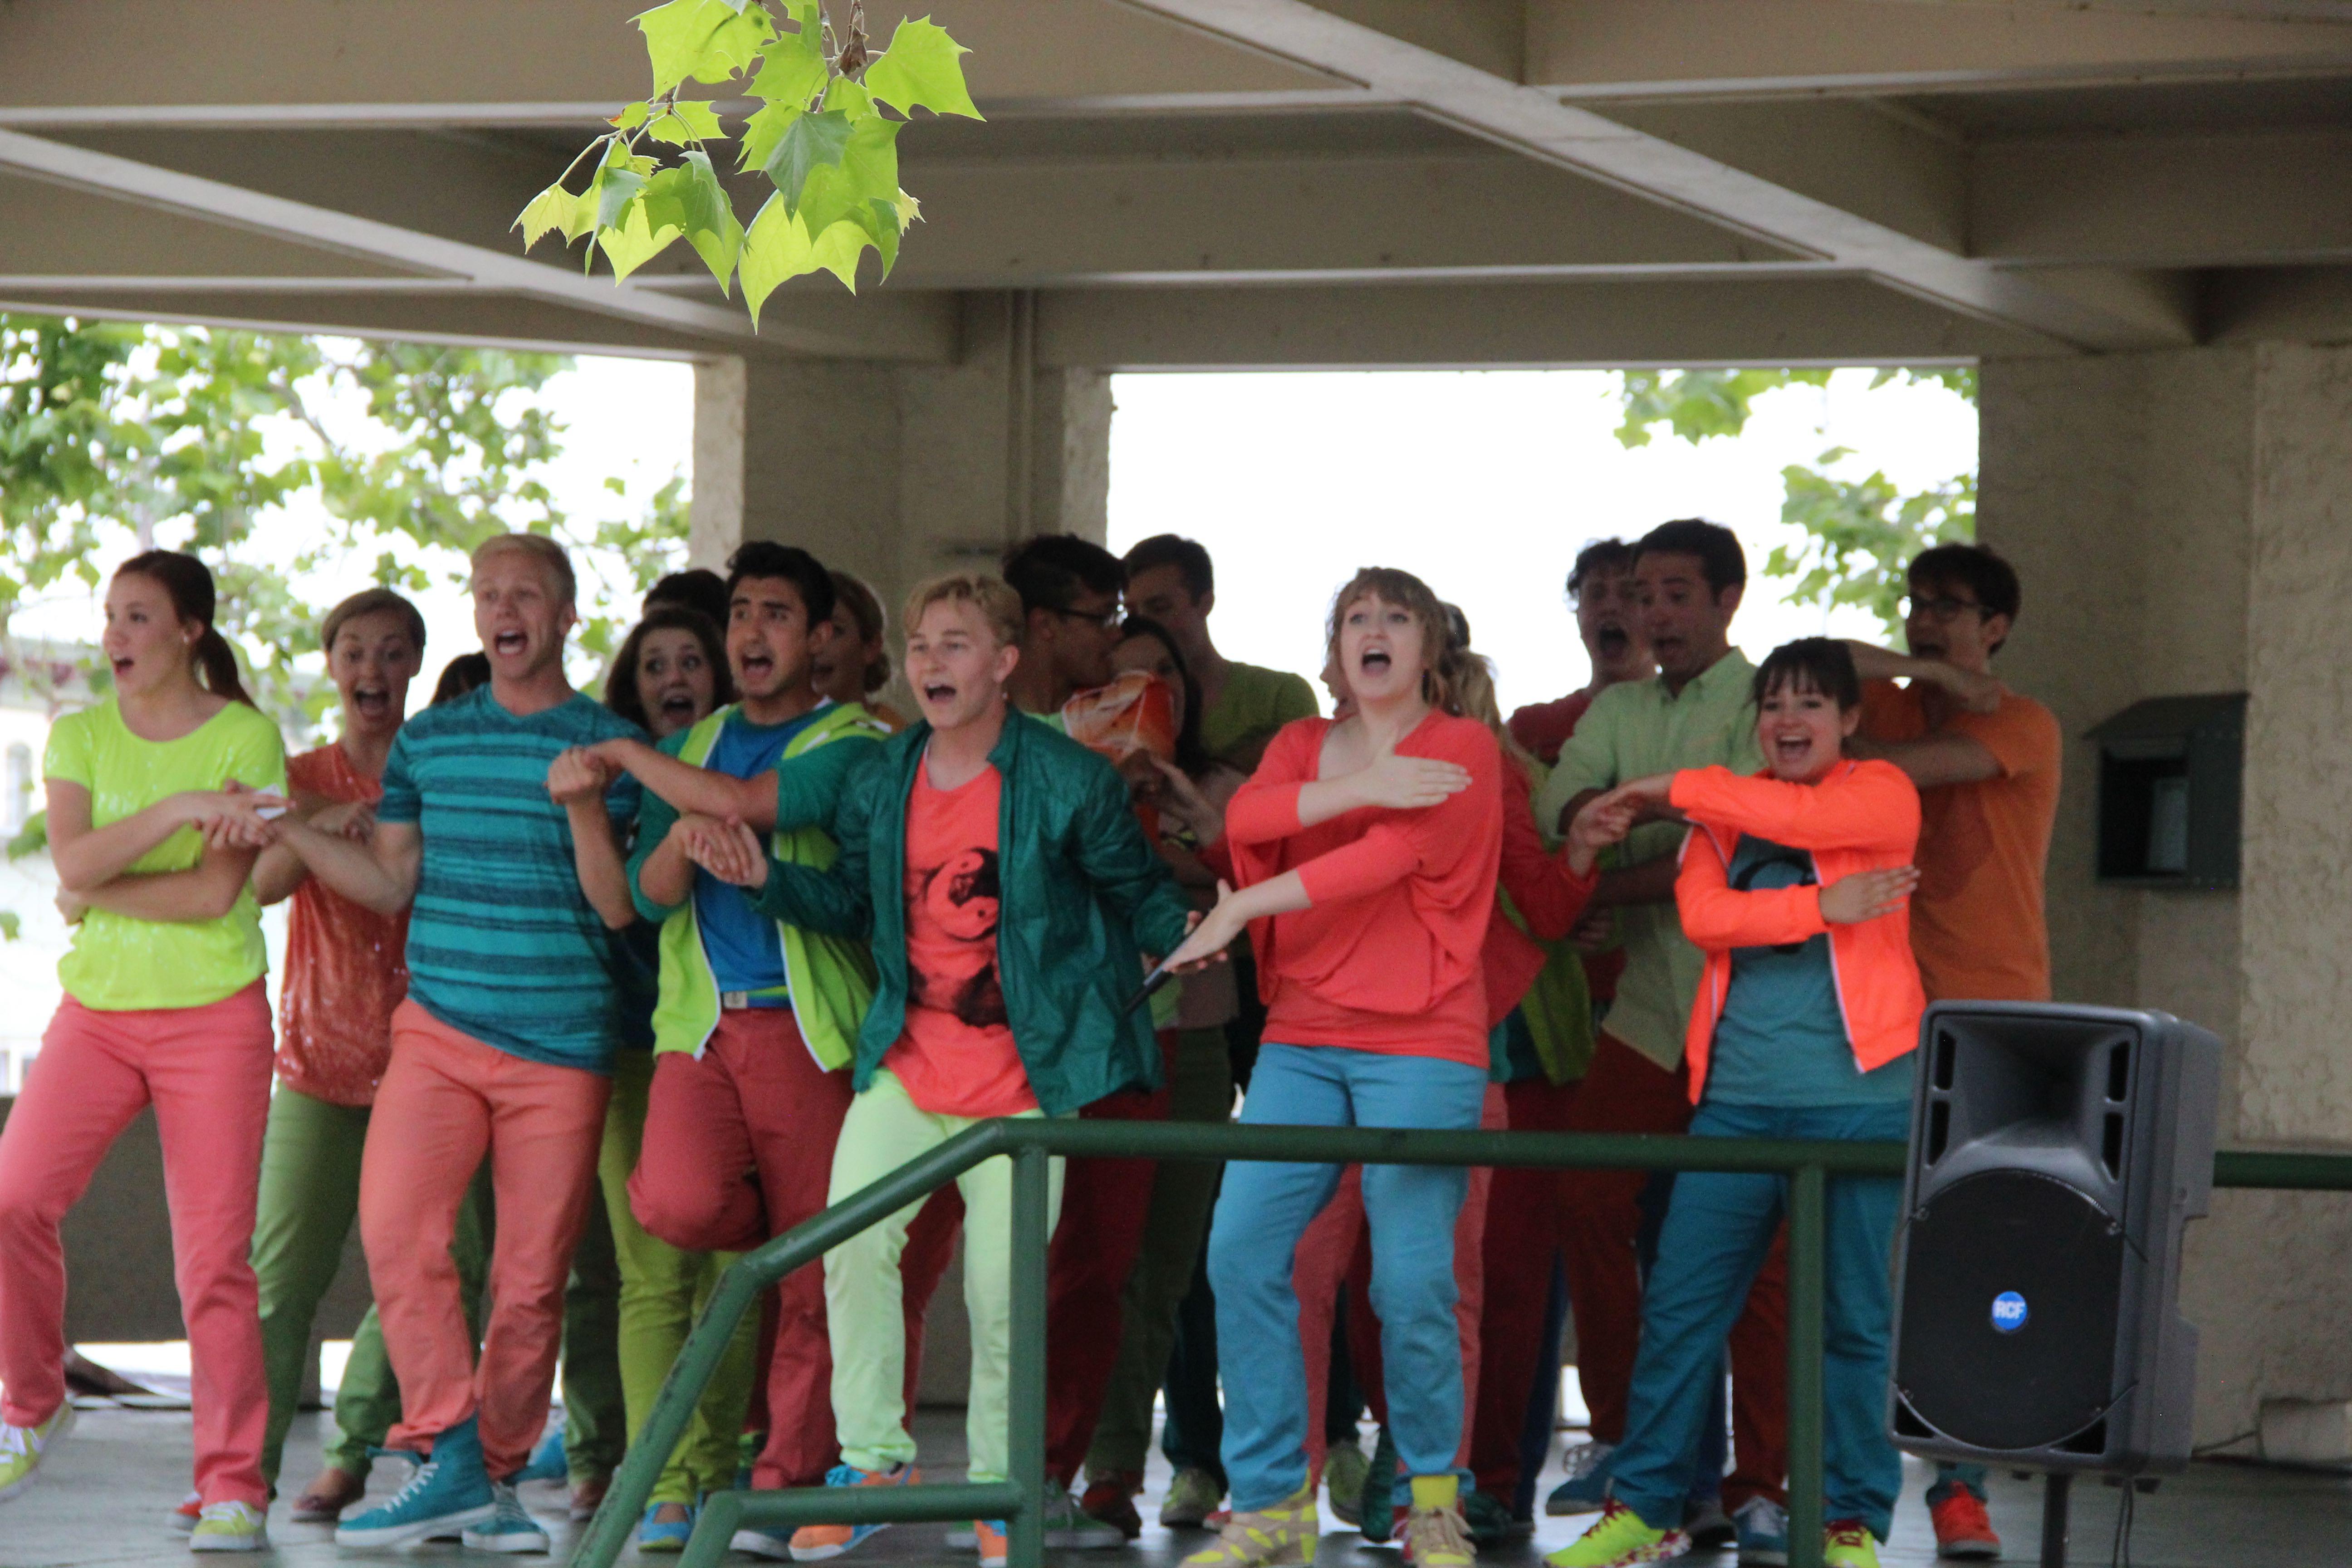 BYU Dancers Perform in Hannibal, MO